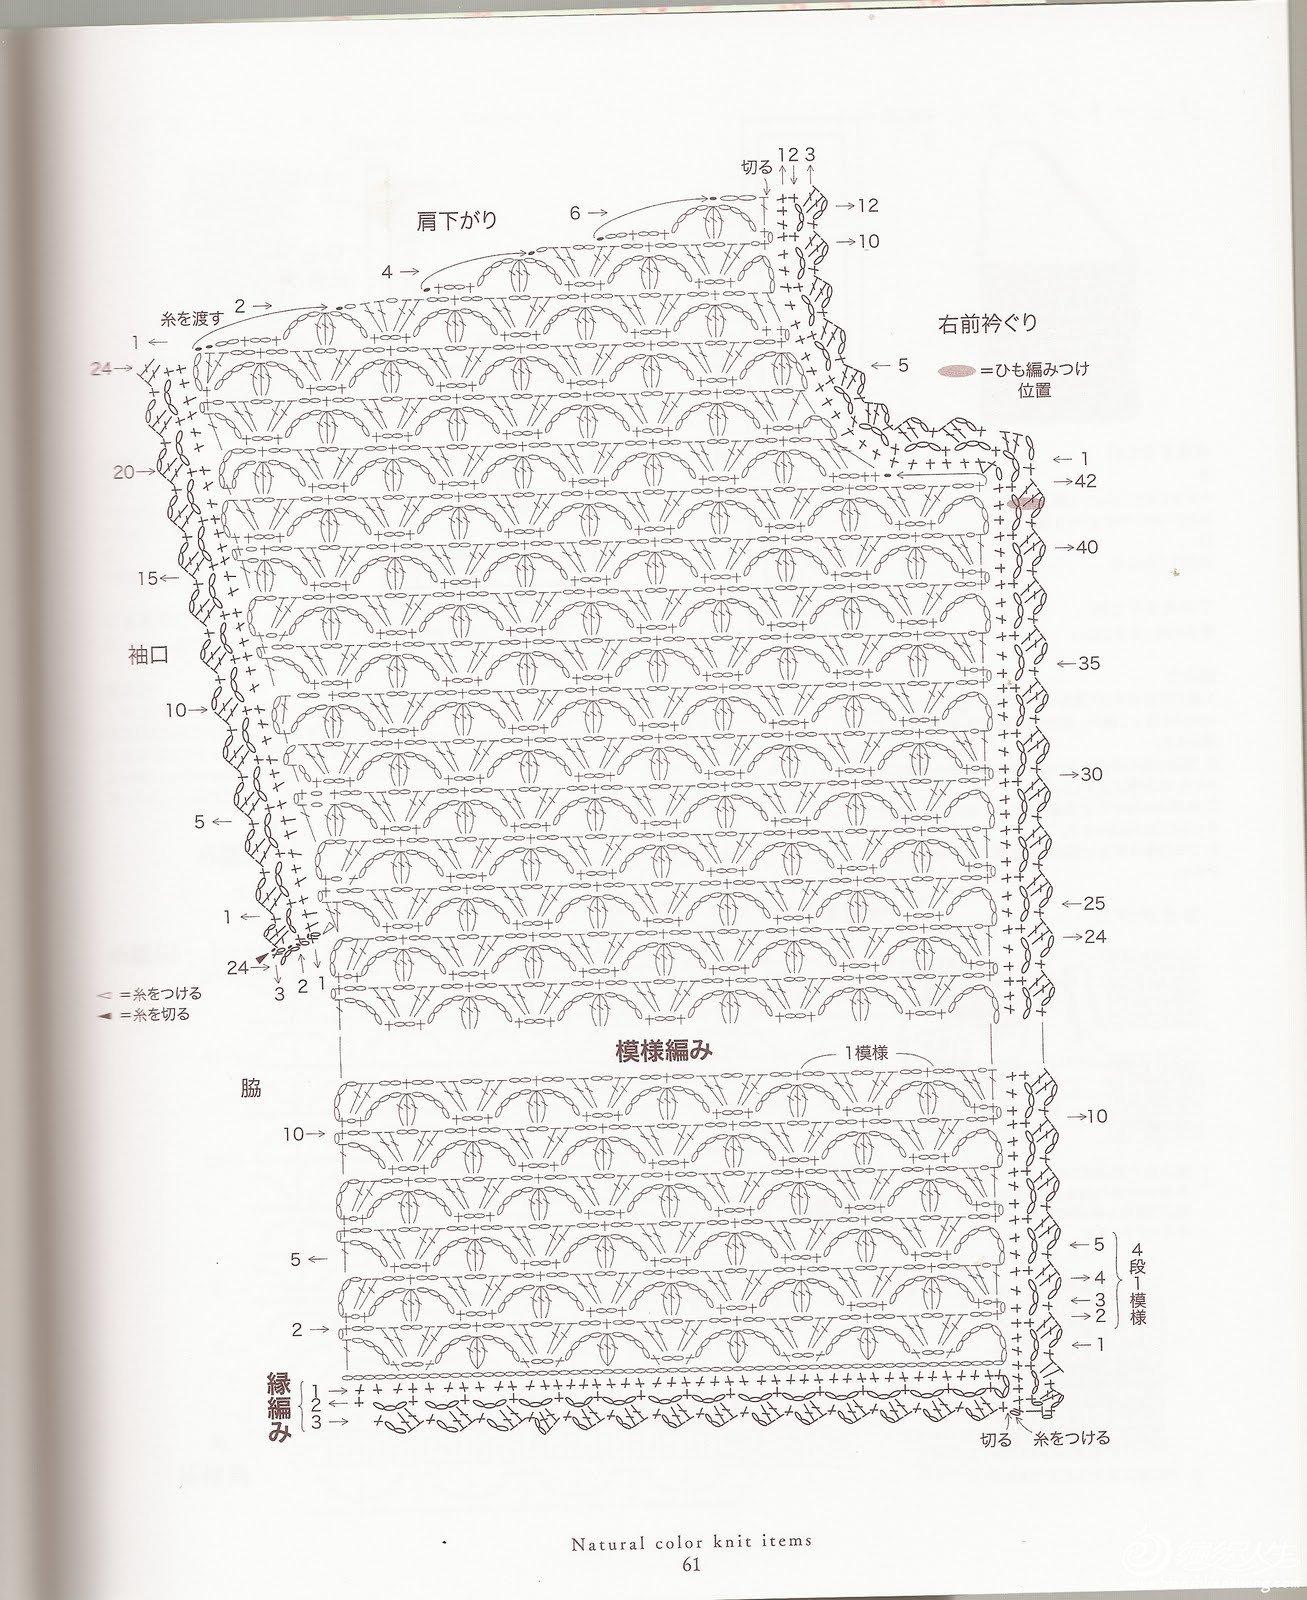 004a (1).JPG